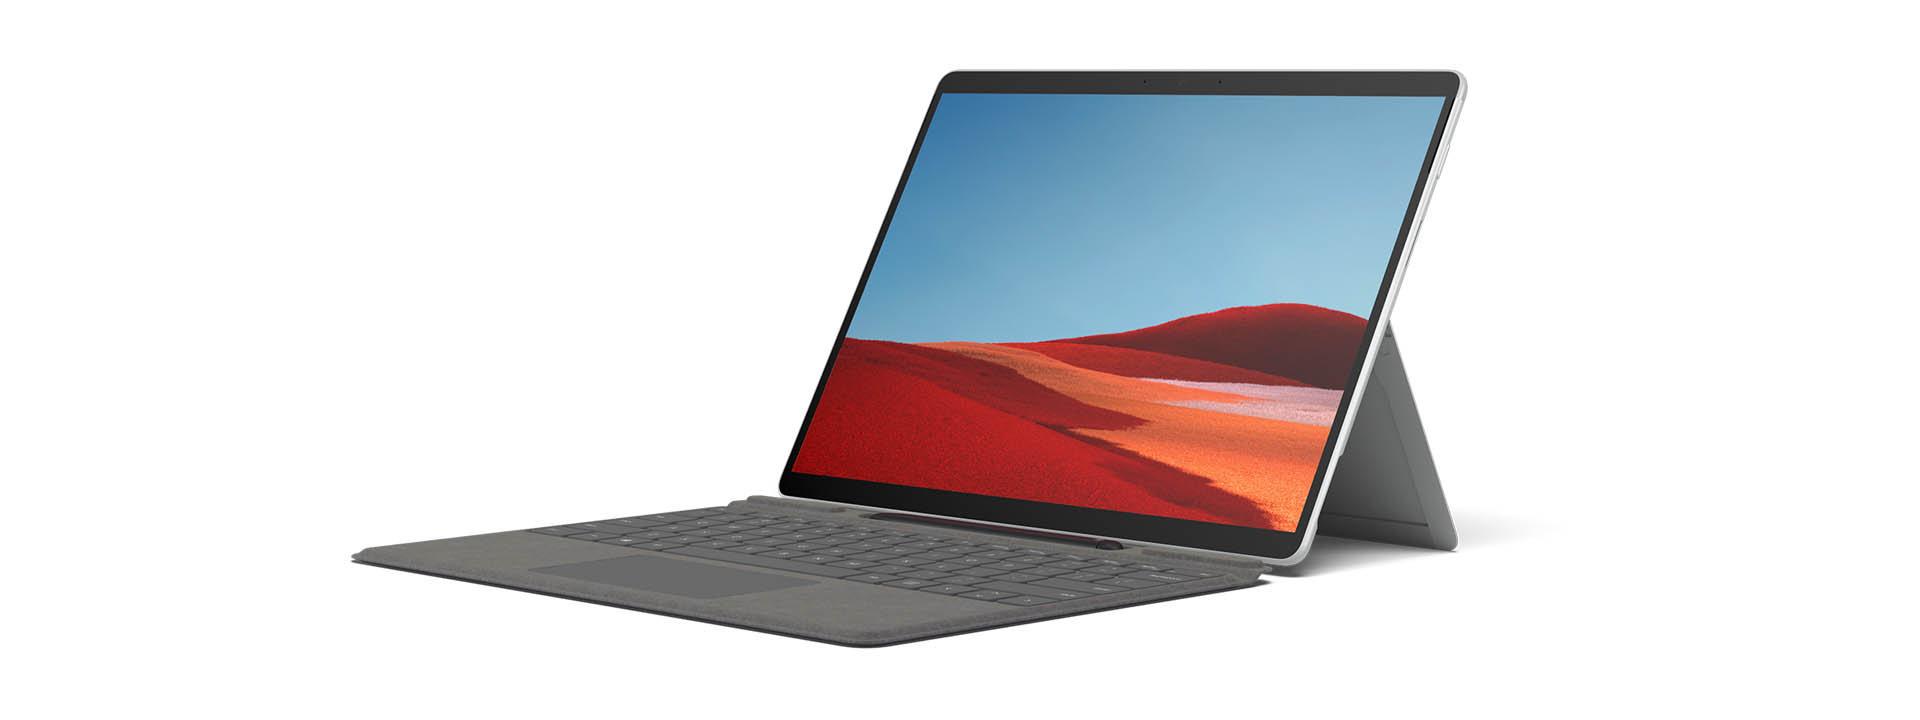 Rotating image of Surface Pro X.